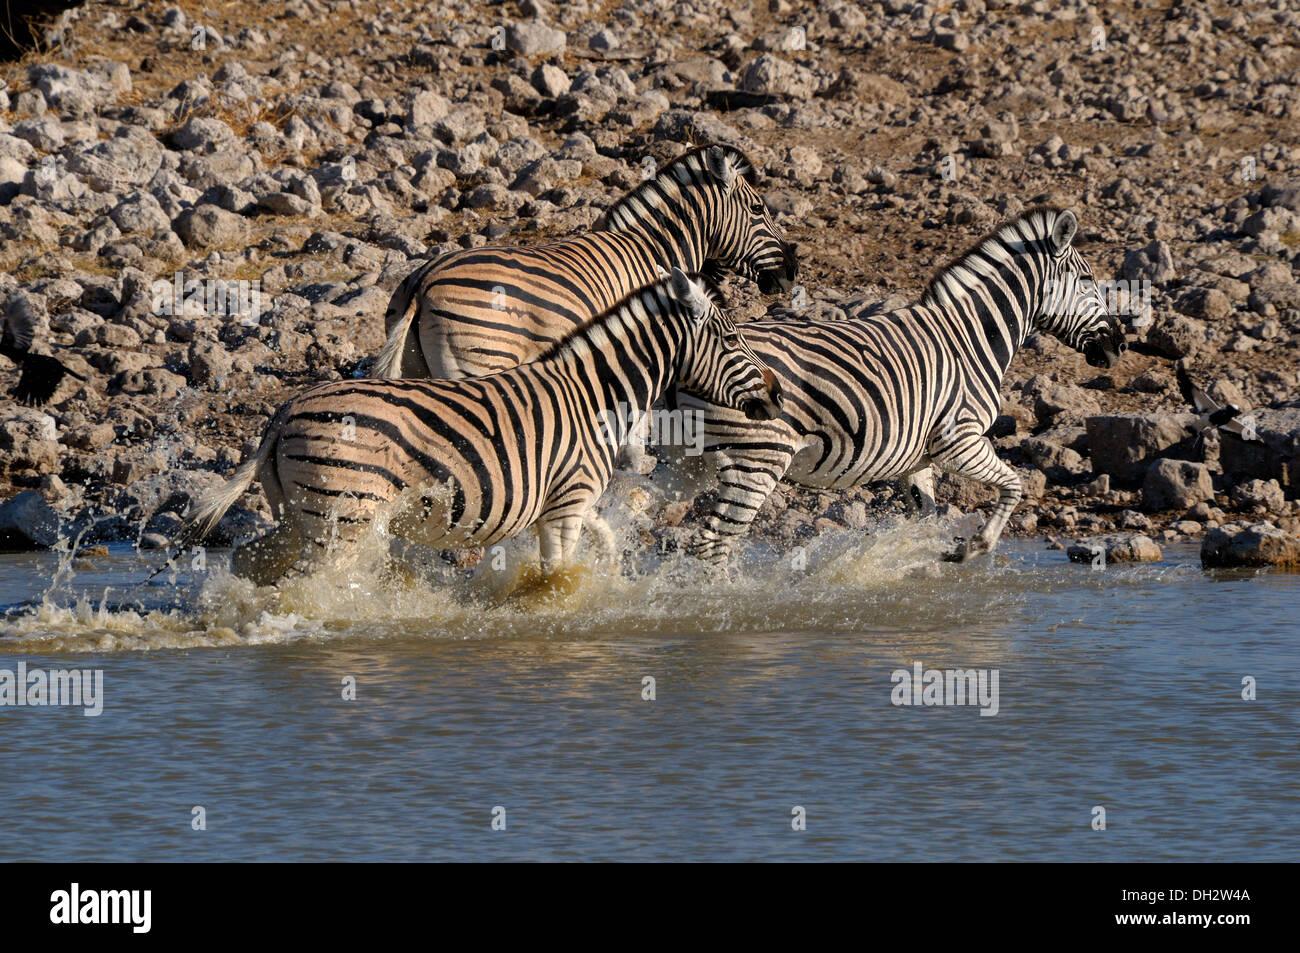 Zebra stampede, Okaukeujo waterhole, Etosha National Park, Namibia - Stock Image